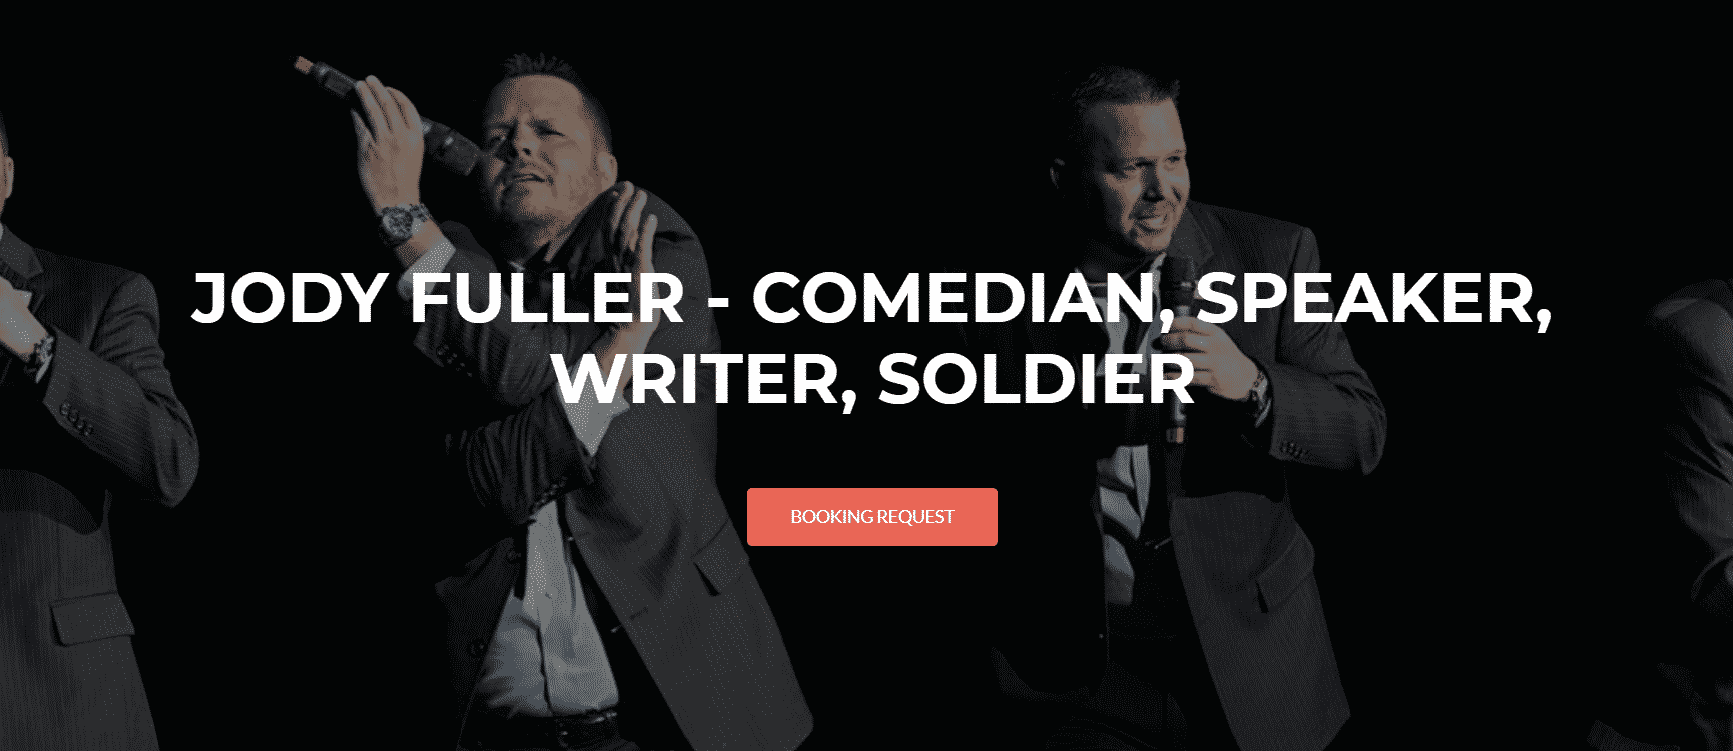 Jody Fuller – JODY FULLER – COMEDIAN, SPEAKER, WRITER, SOLDIER